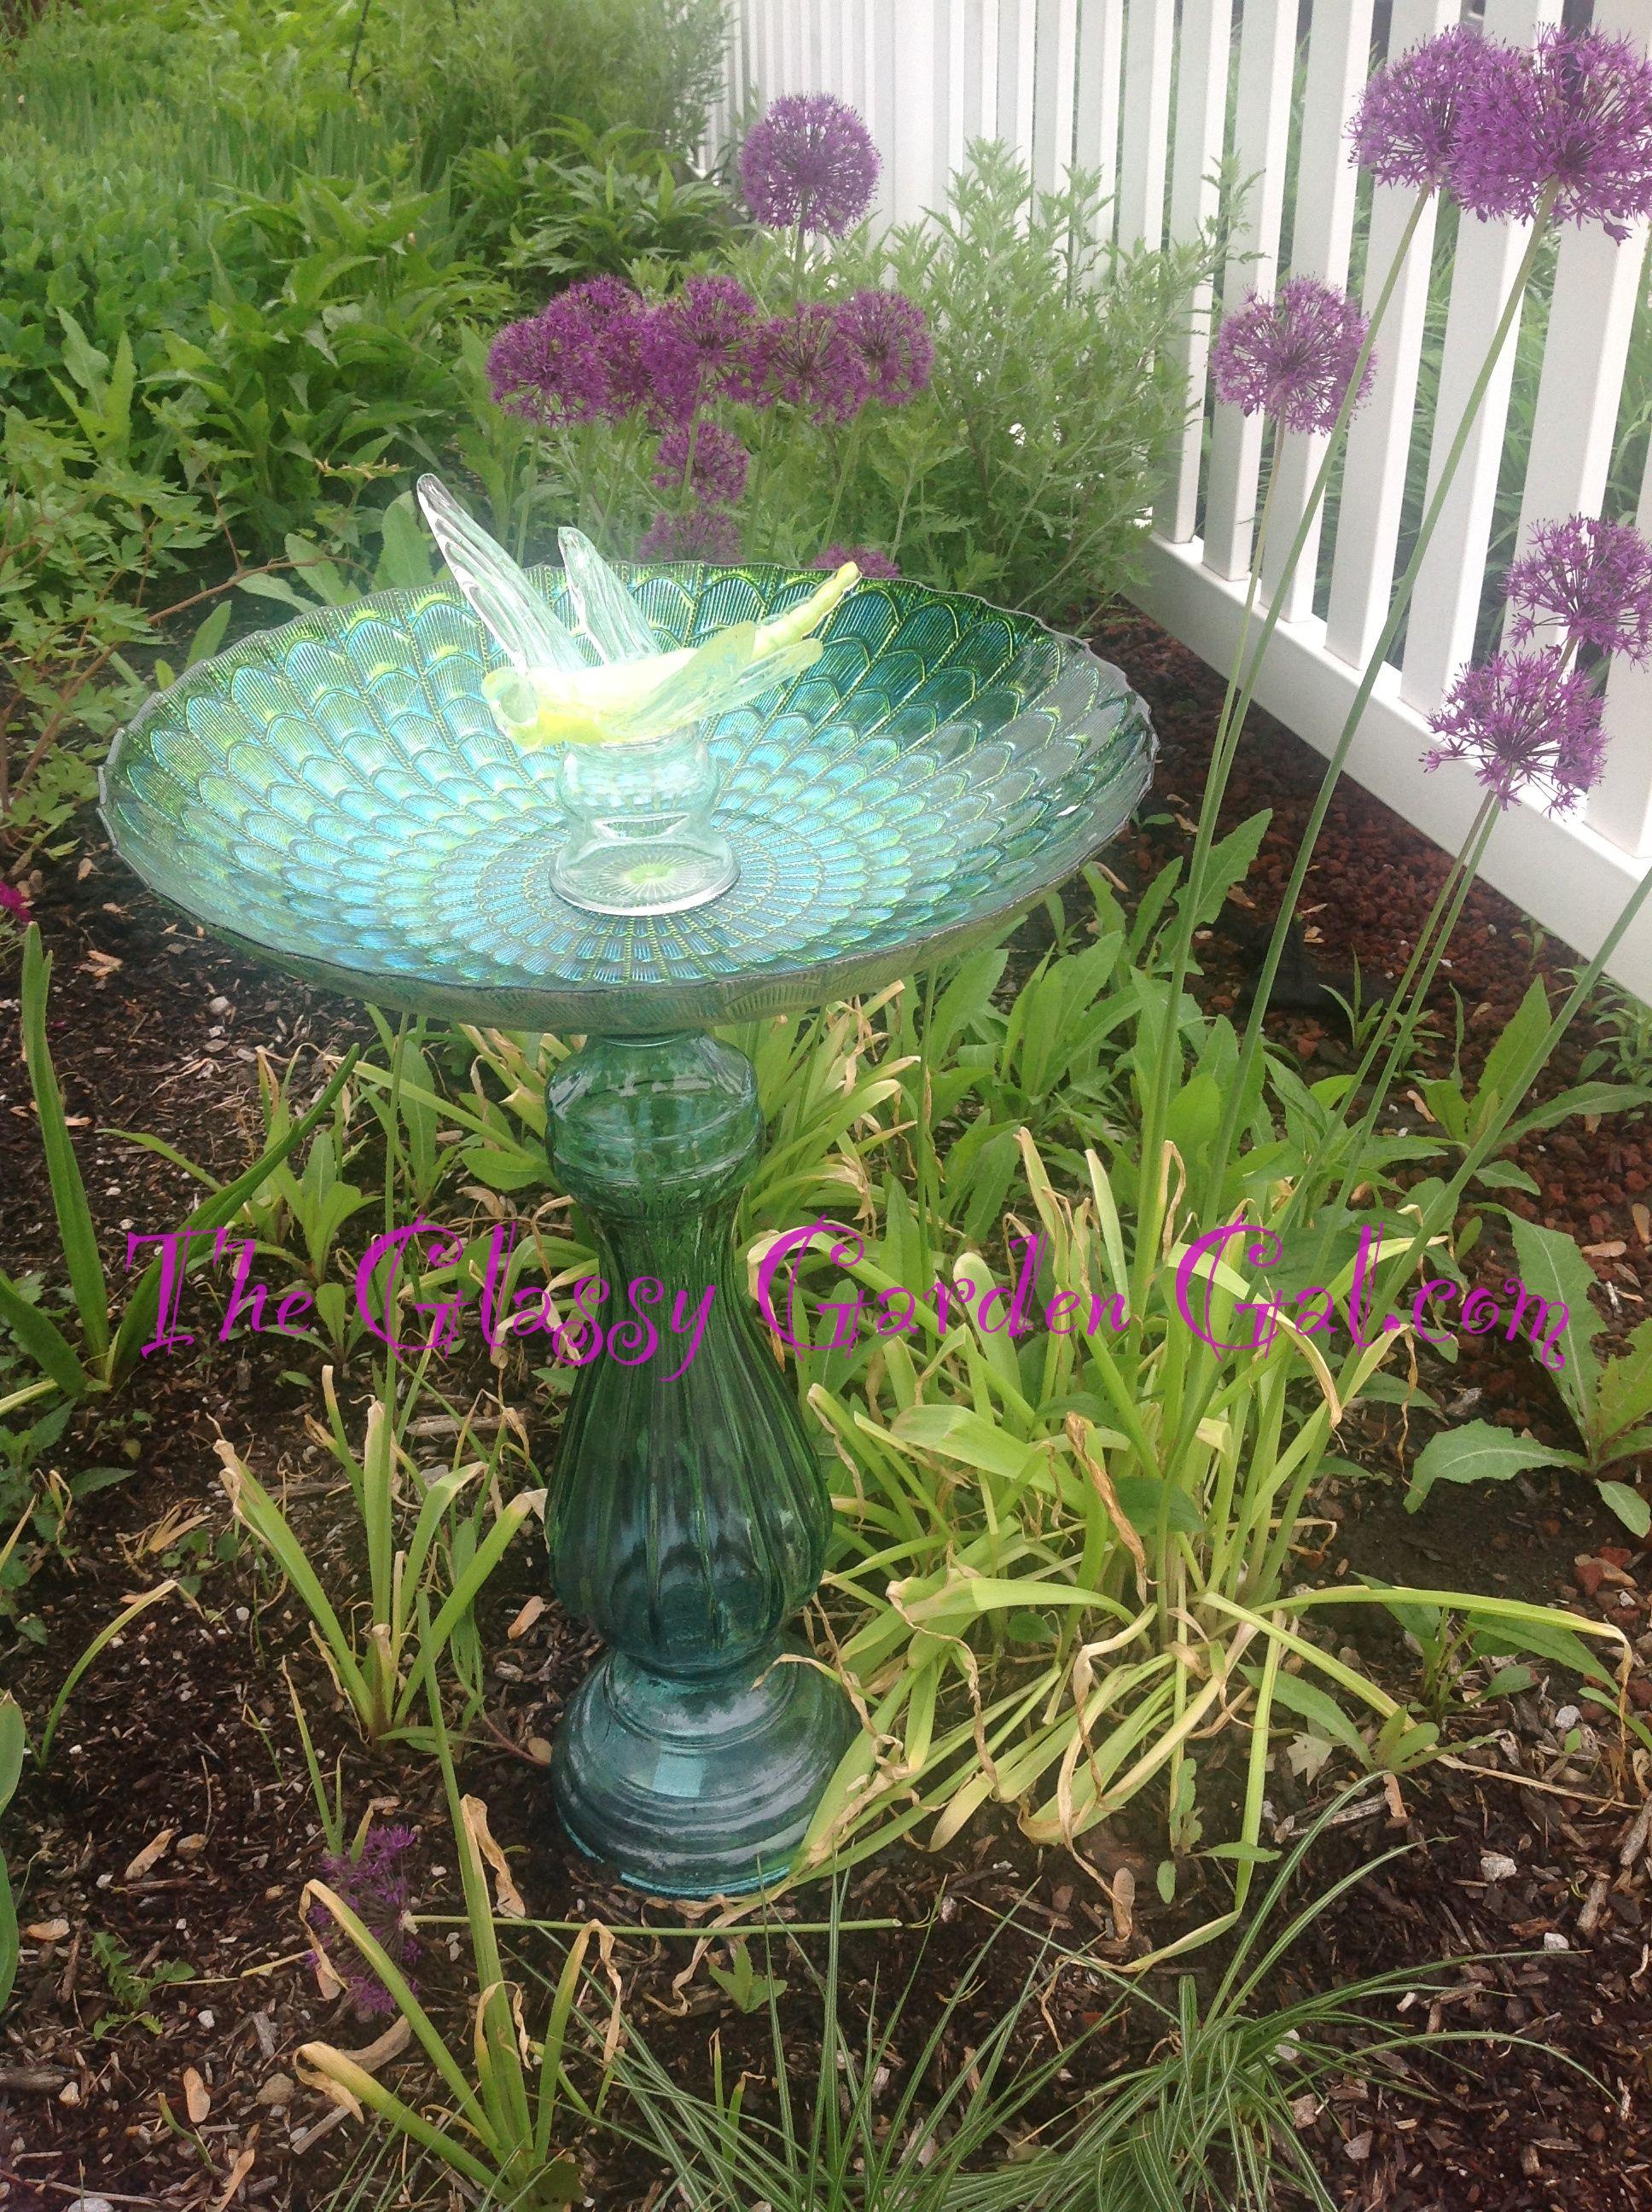 Bird Bath Glass Garden Art Yard Art Repurposed Recycled Up Cycled Glass Unique Garden Decor